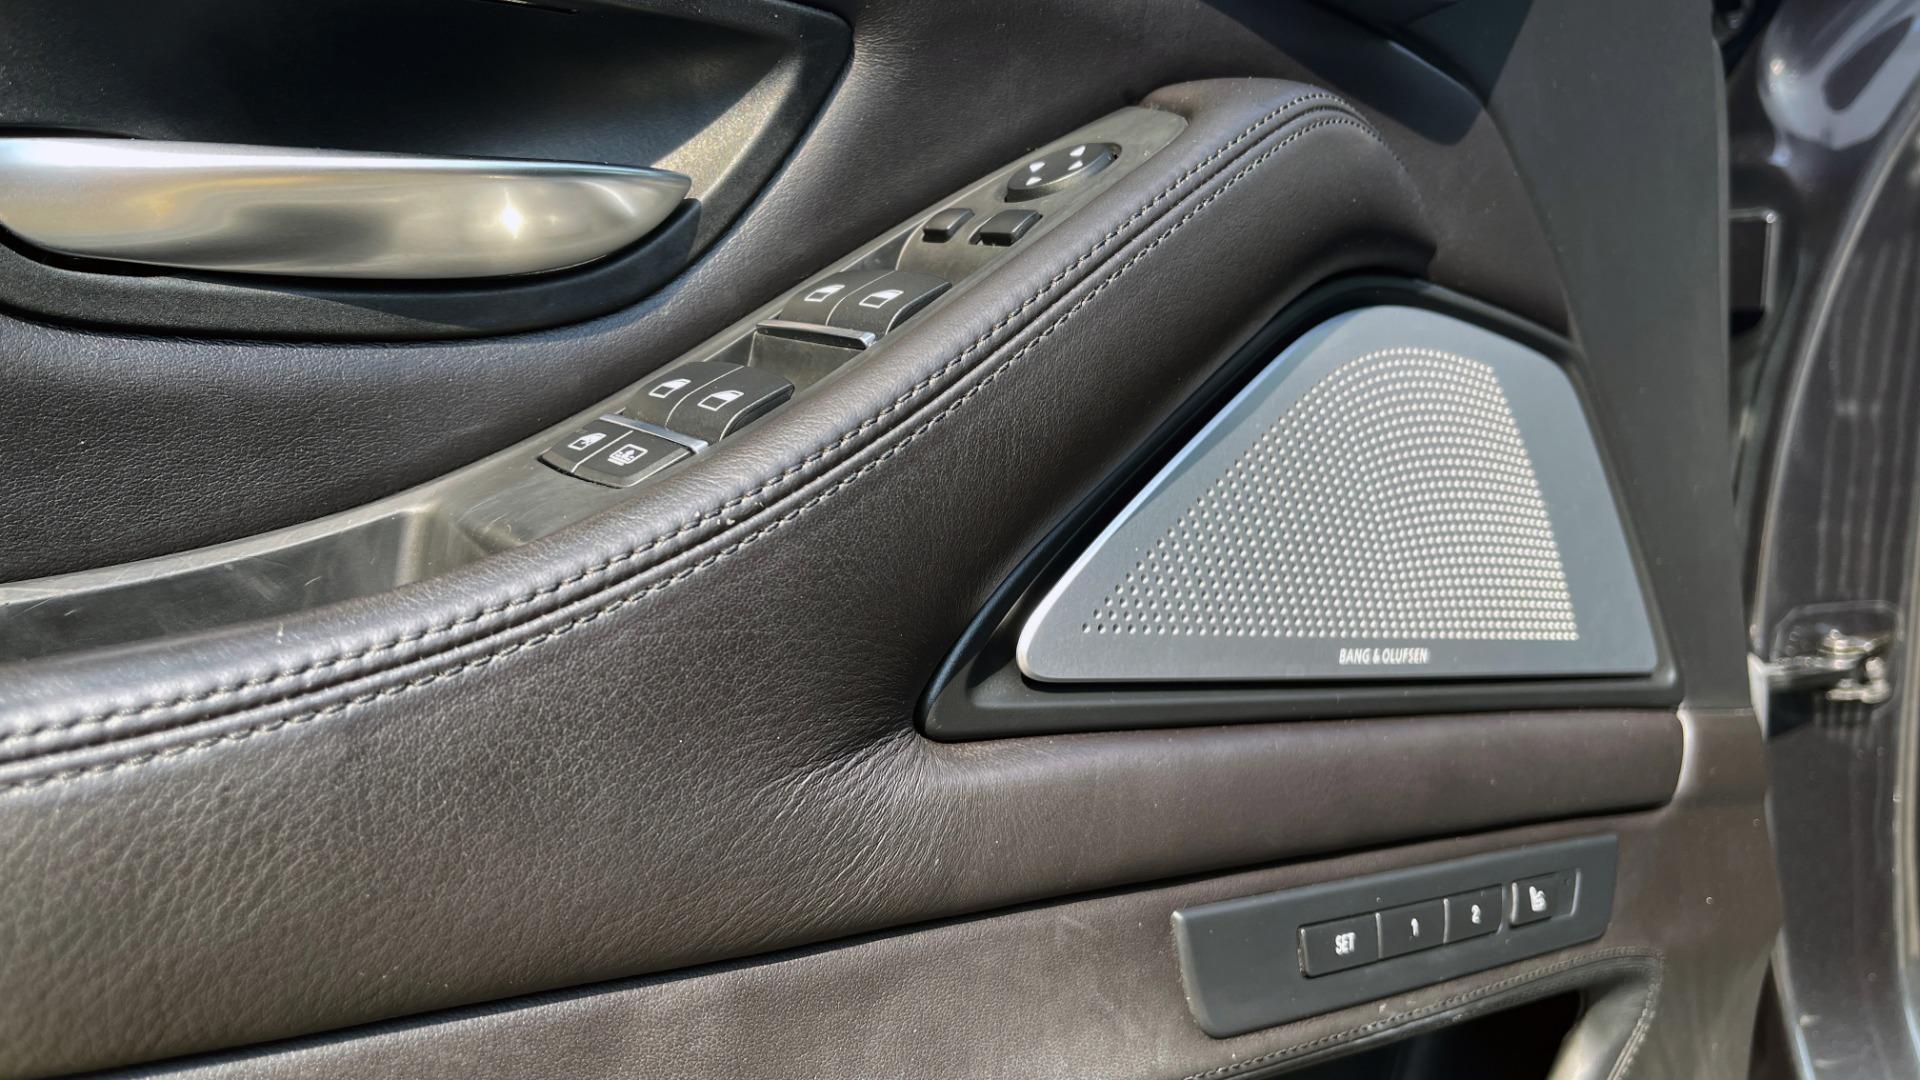 Used 2015 BMW M5 SEDAN / EXEC PKG / HUD / NAV / B&O SND / SUNROOF / REARVIEW for sale Sold at Formula Imports in Charlotte NC 28227 37